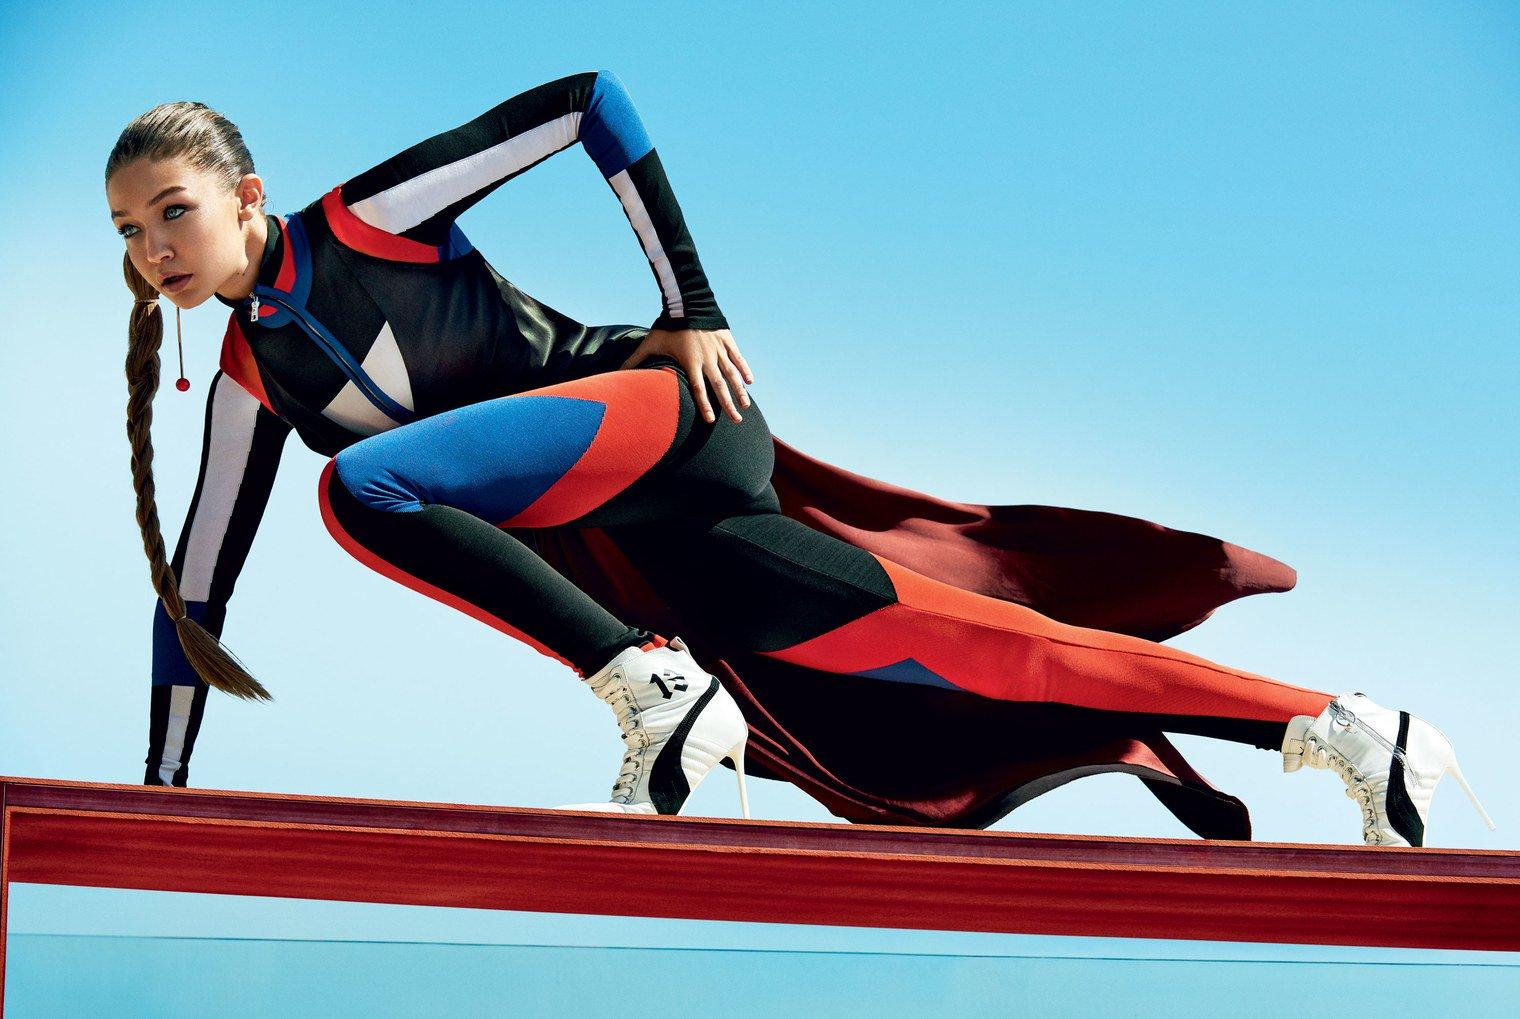 This new body-sculpting workout will make you feel like a superhero: https://t.co/b81YKlsLRL https://t.co/r6RnzkZgK9